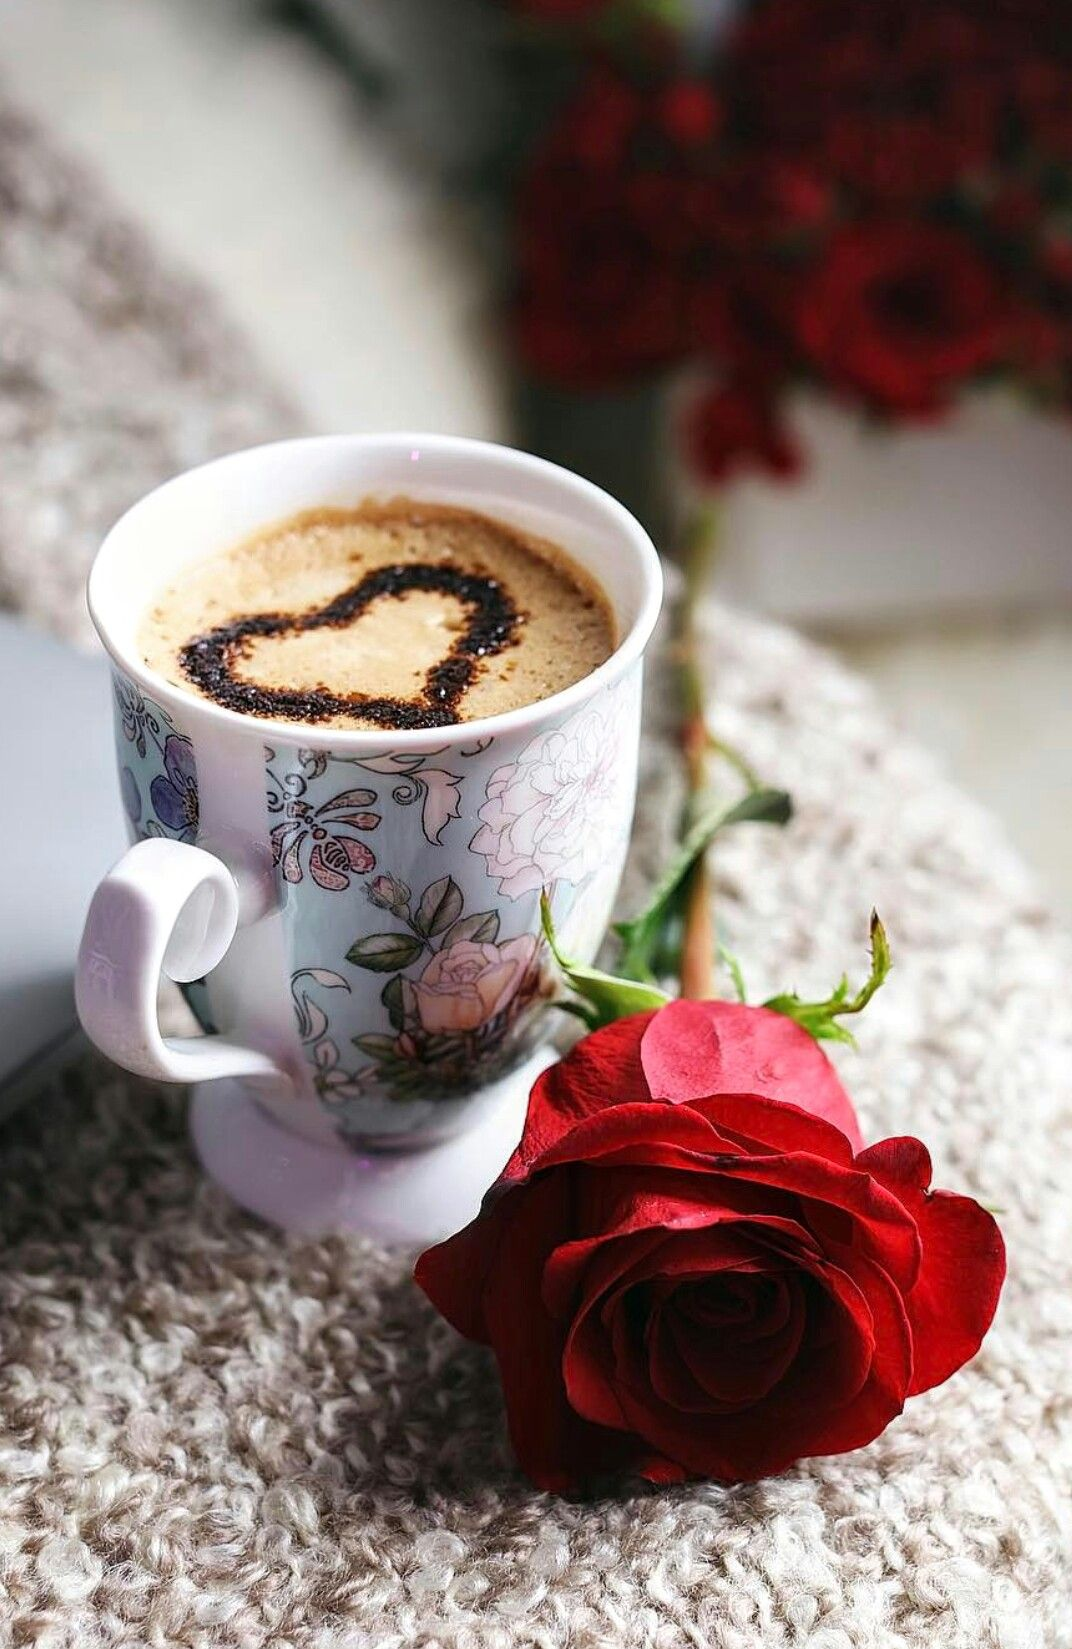 Pin By Kamala Khadka On Coffee Good Morning Coffee Coffee Love Coffee Pictures